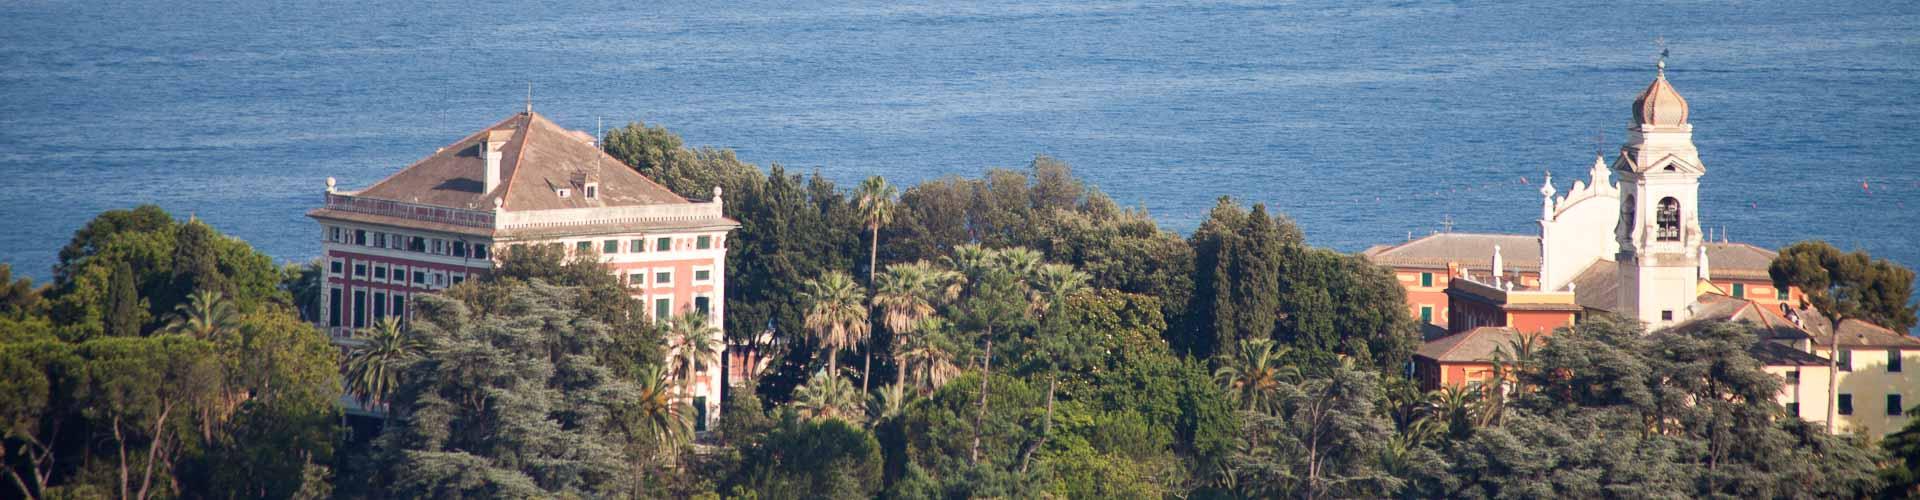 villa durazzo santa margherita ligure-1